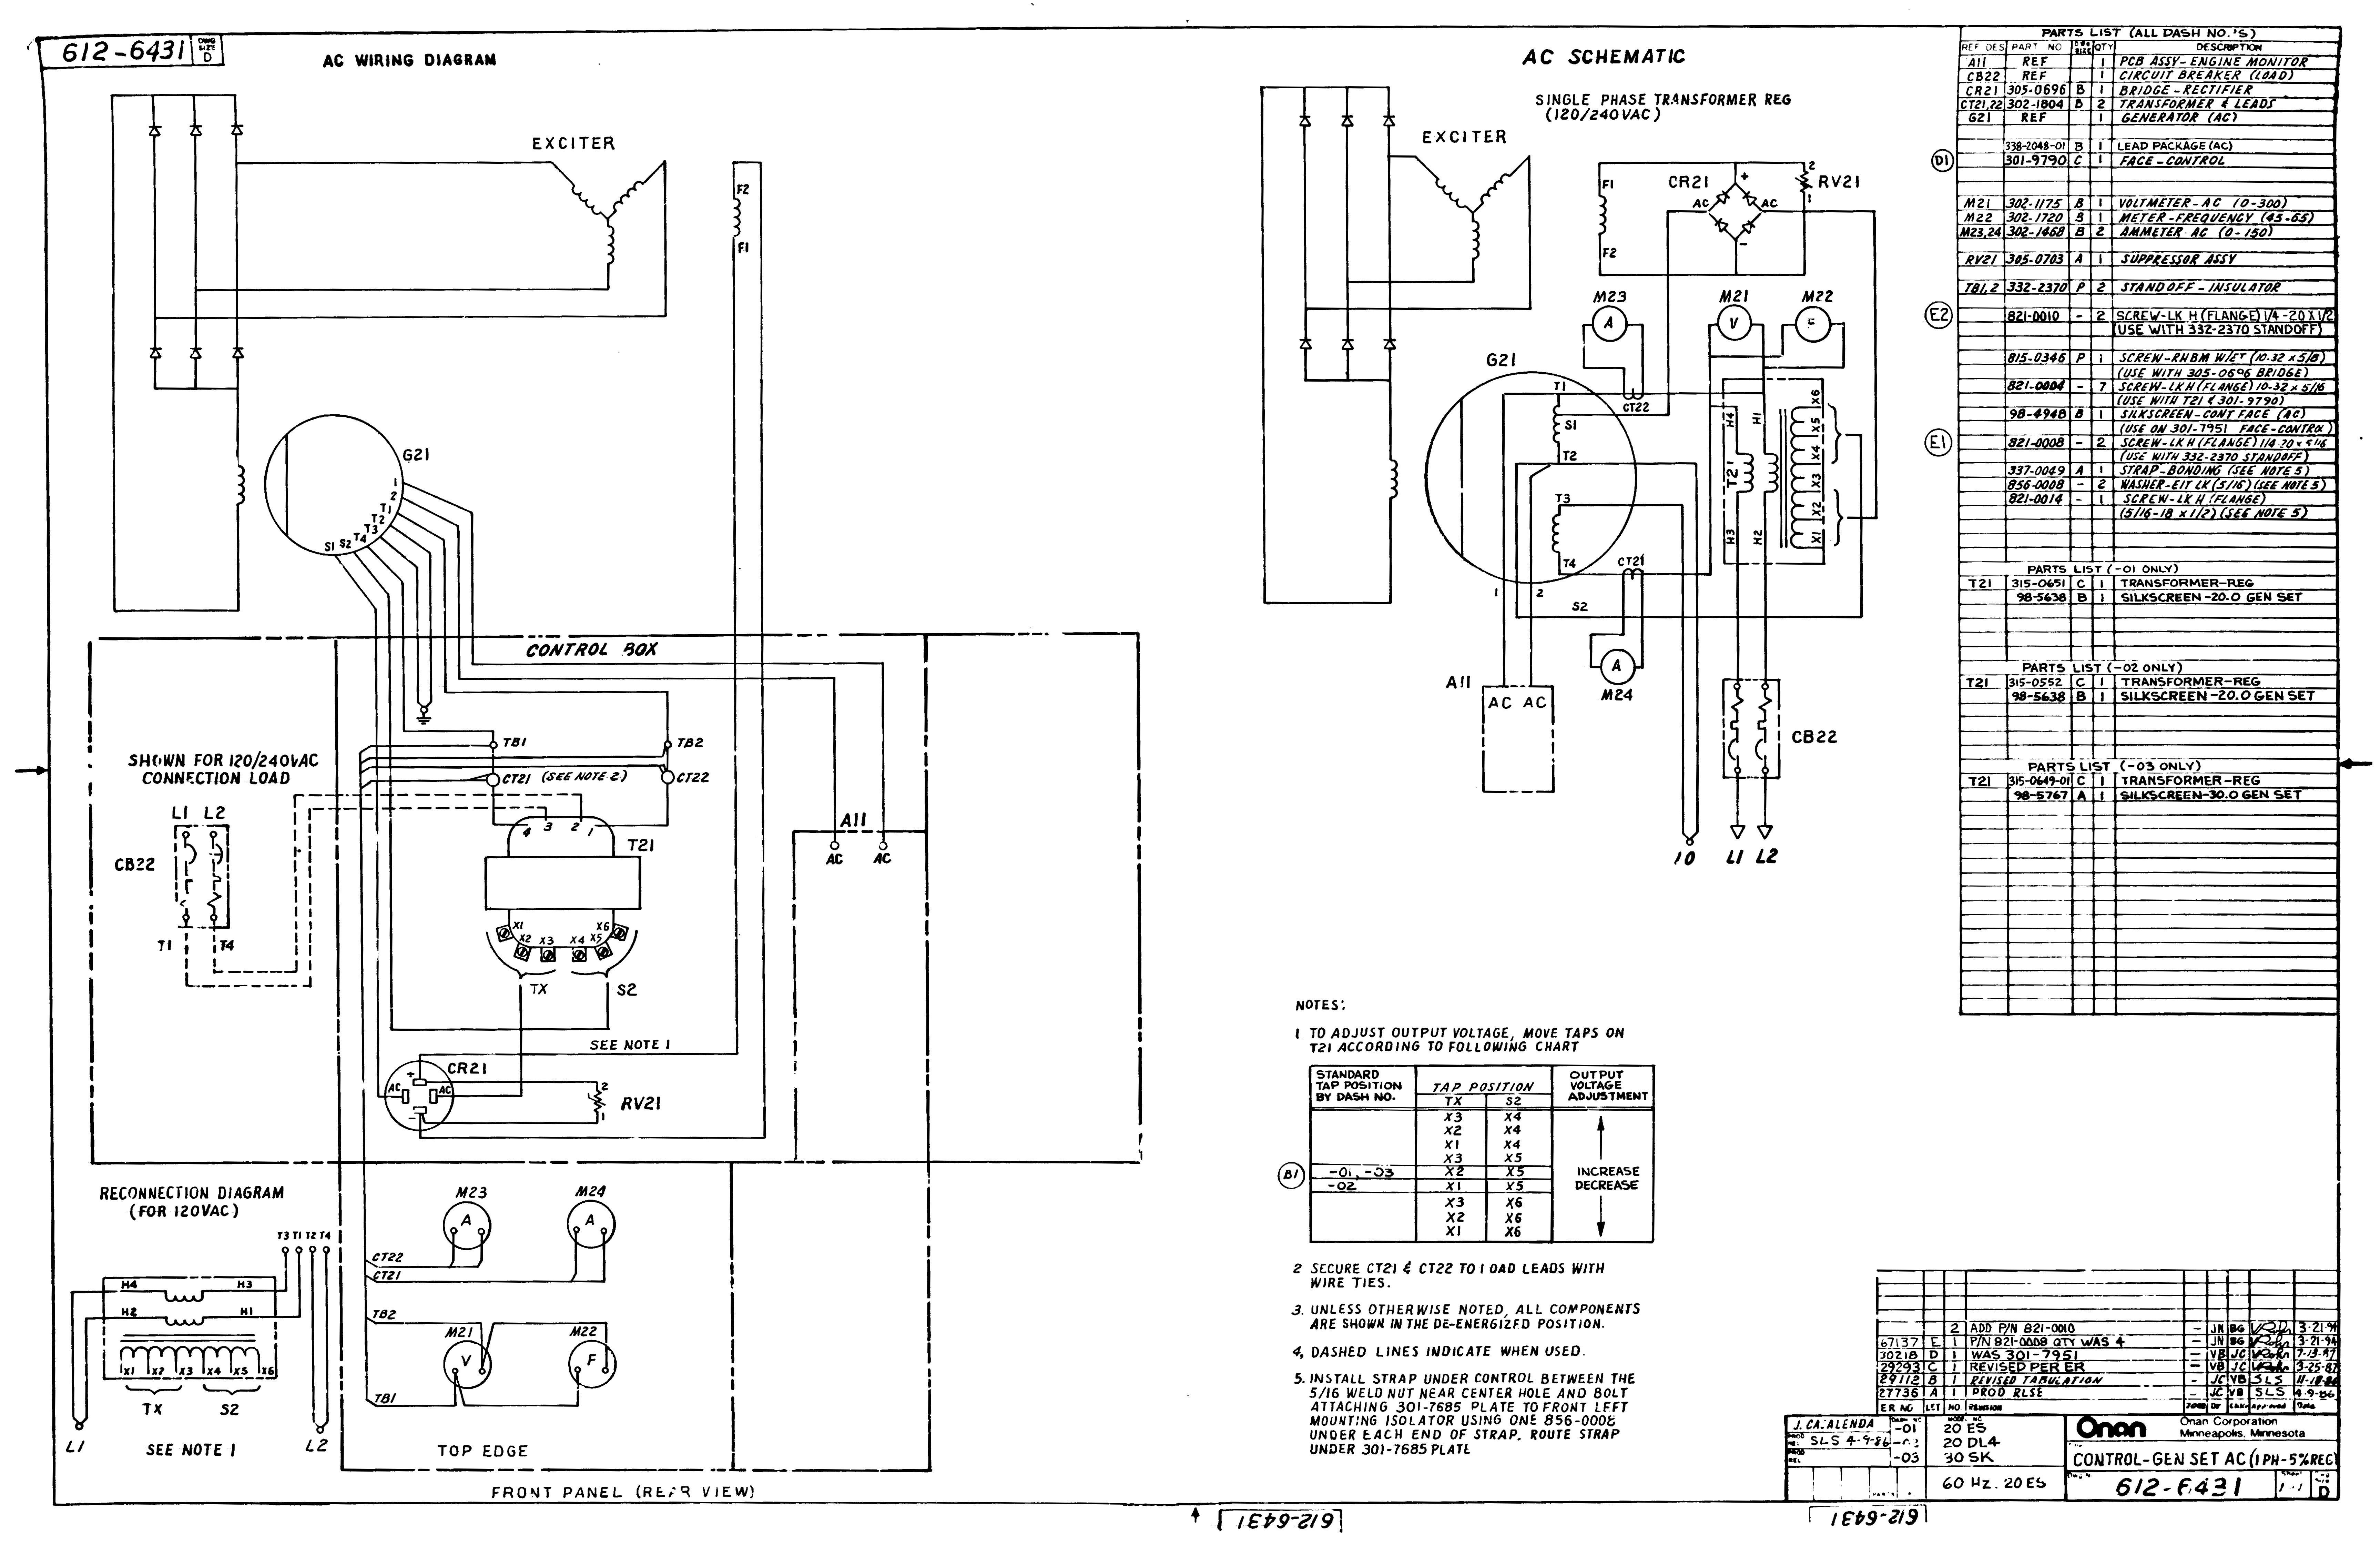 [DIAGRAM_38ZD]  MS_2966] Onan 4000 Generator Wiring Diagram 3 Phase Download Diagram | Wiring Diagram Onan Genset |  | Wiluq Barba Hylec Pap Rect Mohammedshrine Librar Wiring 101